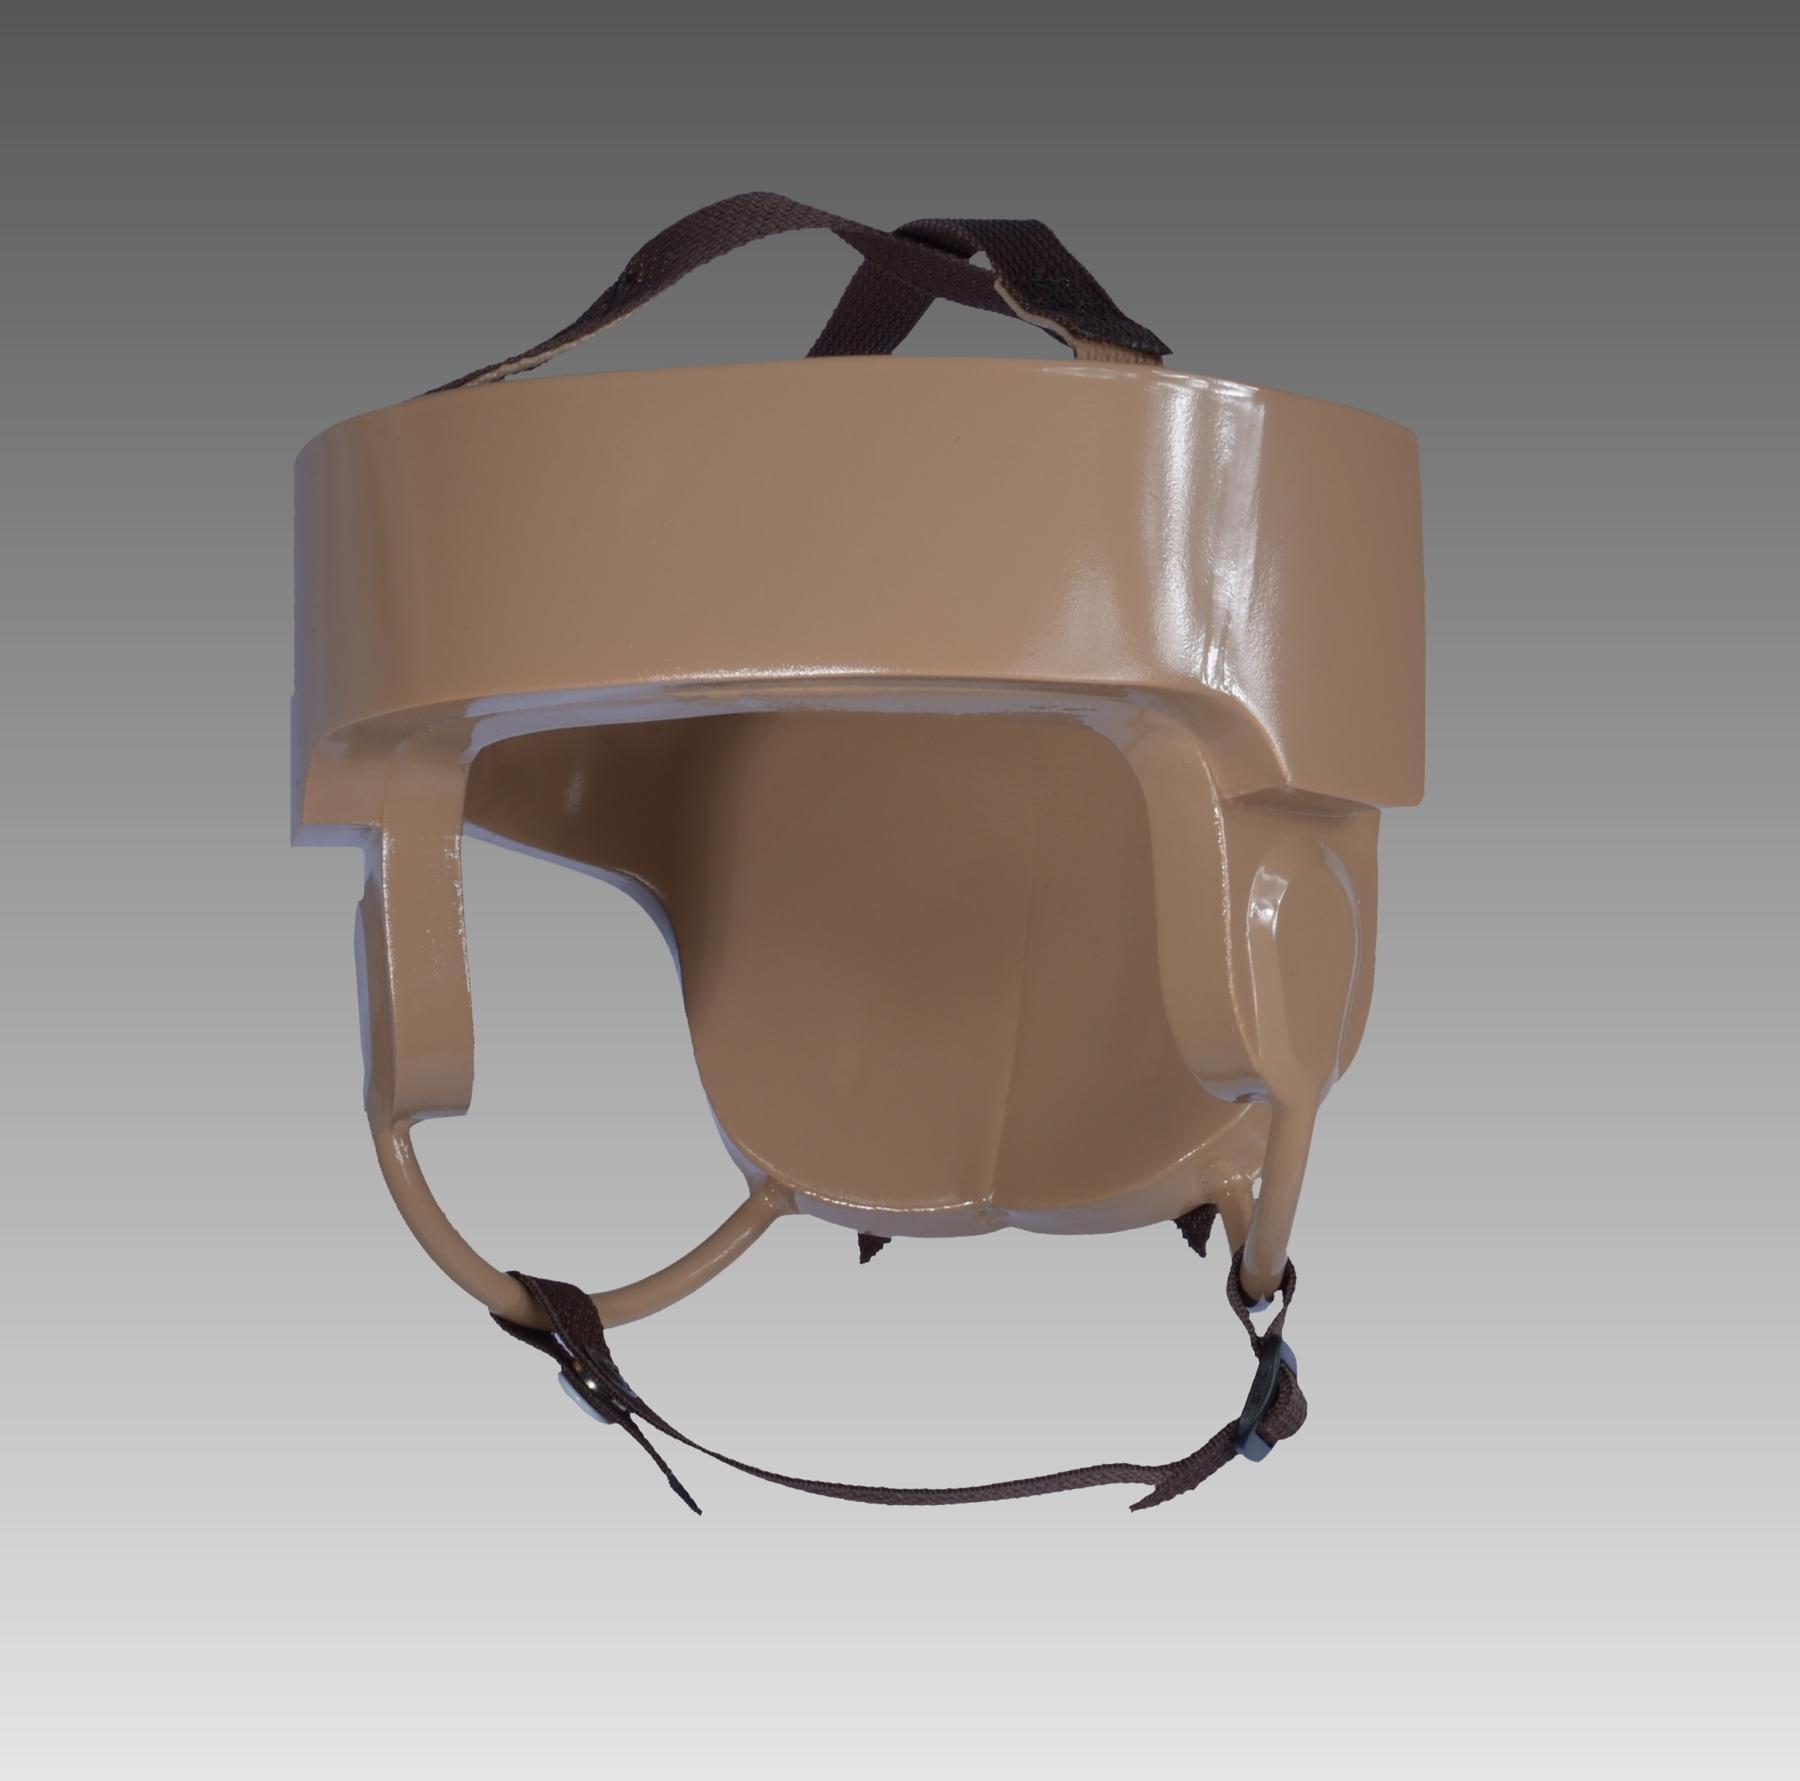 Danmar Halo Helmet-Casa Tan,X-Large,Each